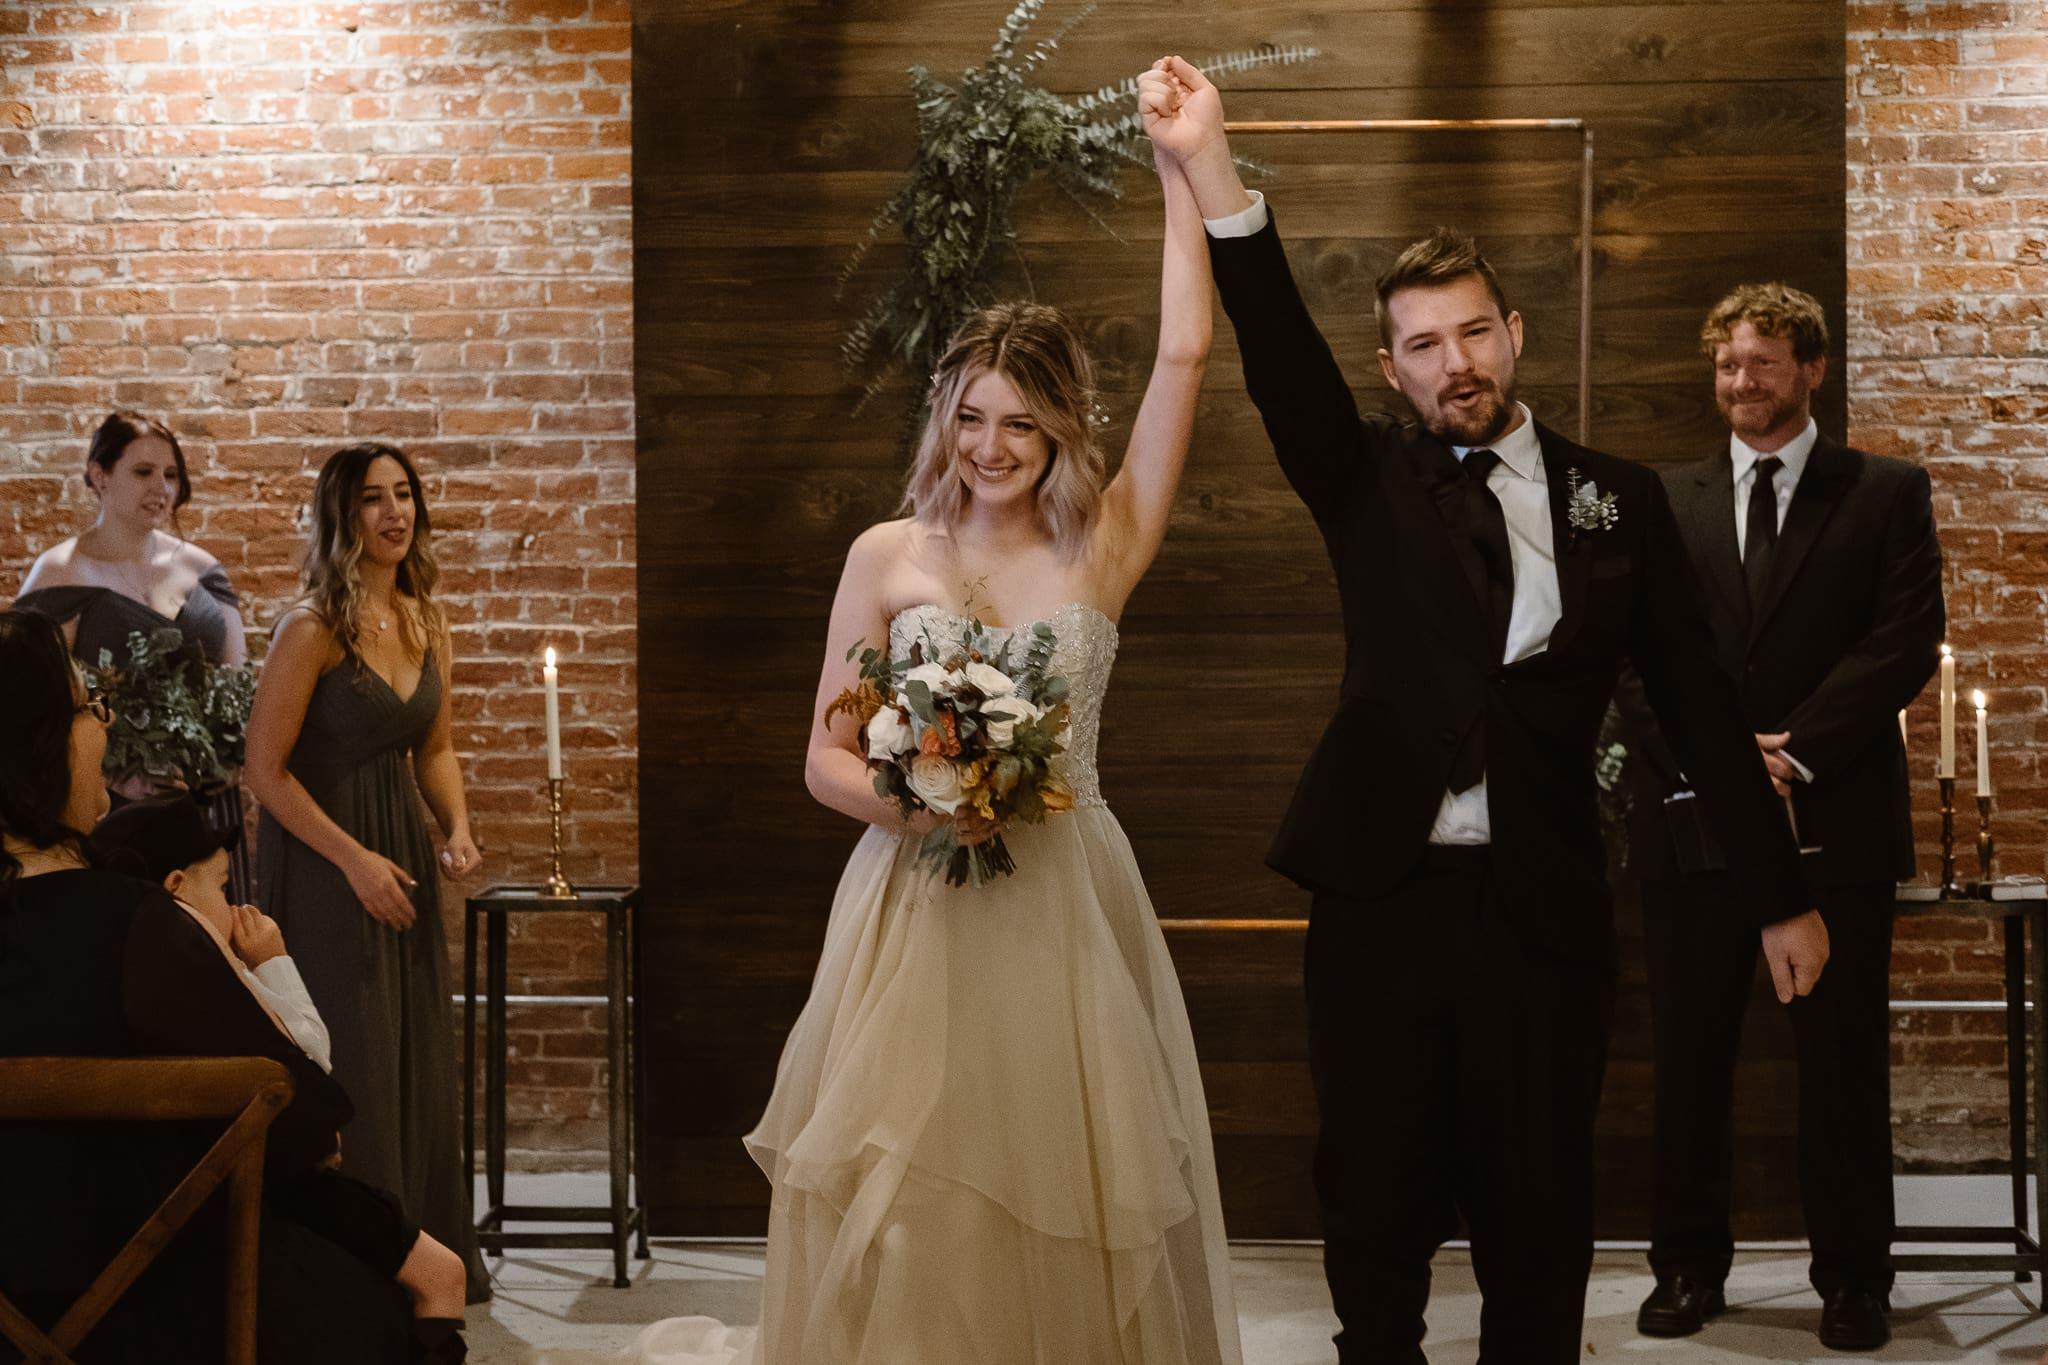 St Vrain Wedding Photographer | Longmont Wedding Photographer | Colorado Winter Wedding Photographer, Colorado industrial chic wedding ceremony, ceremony recessional